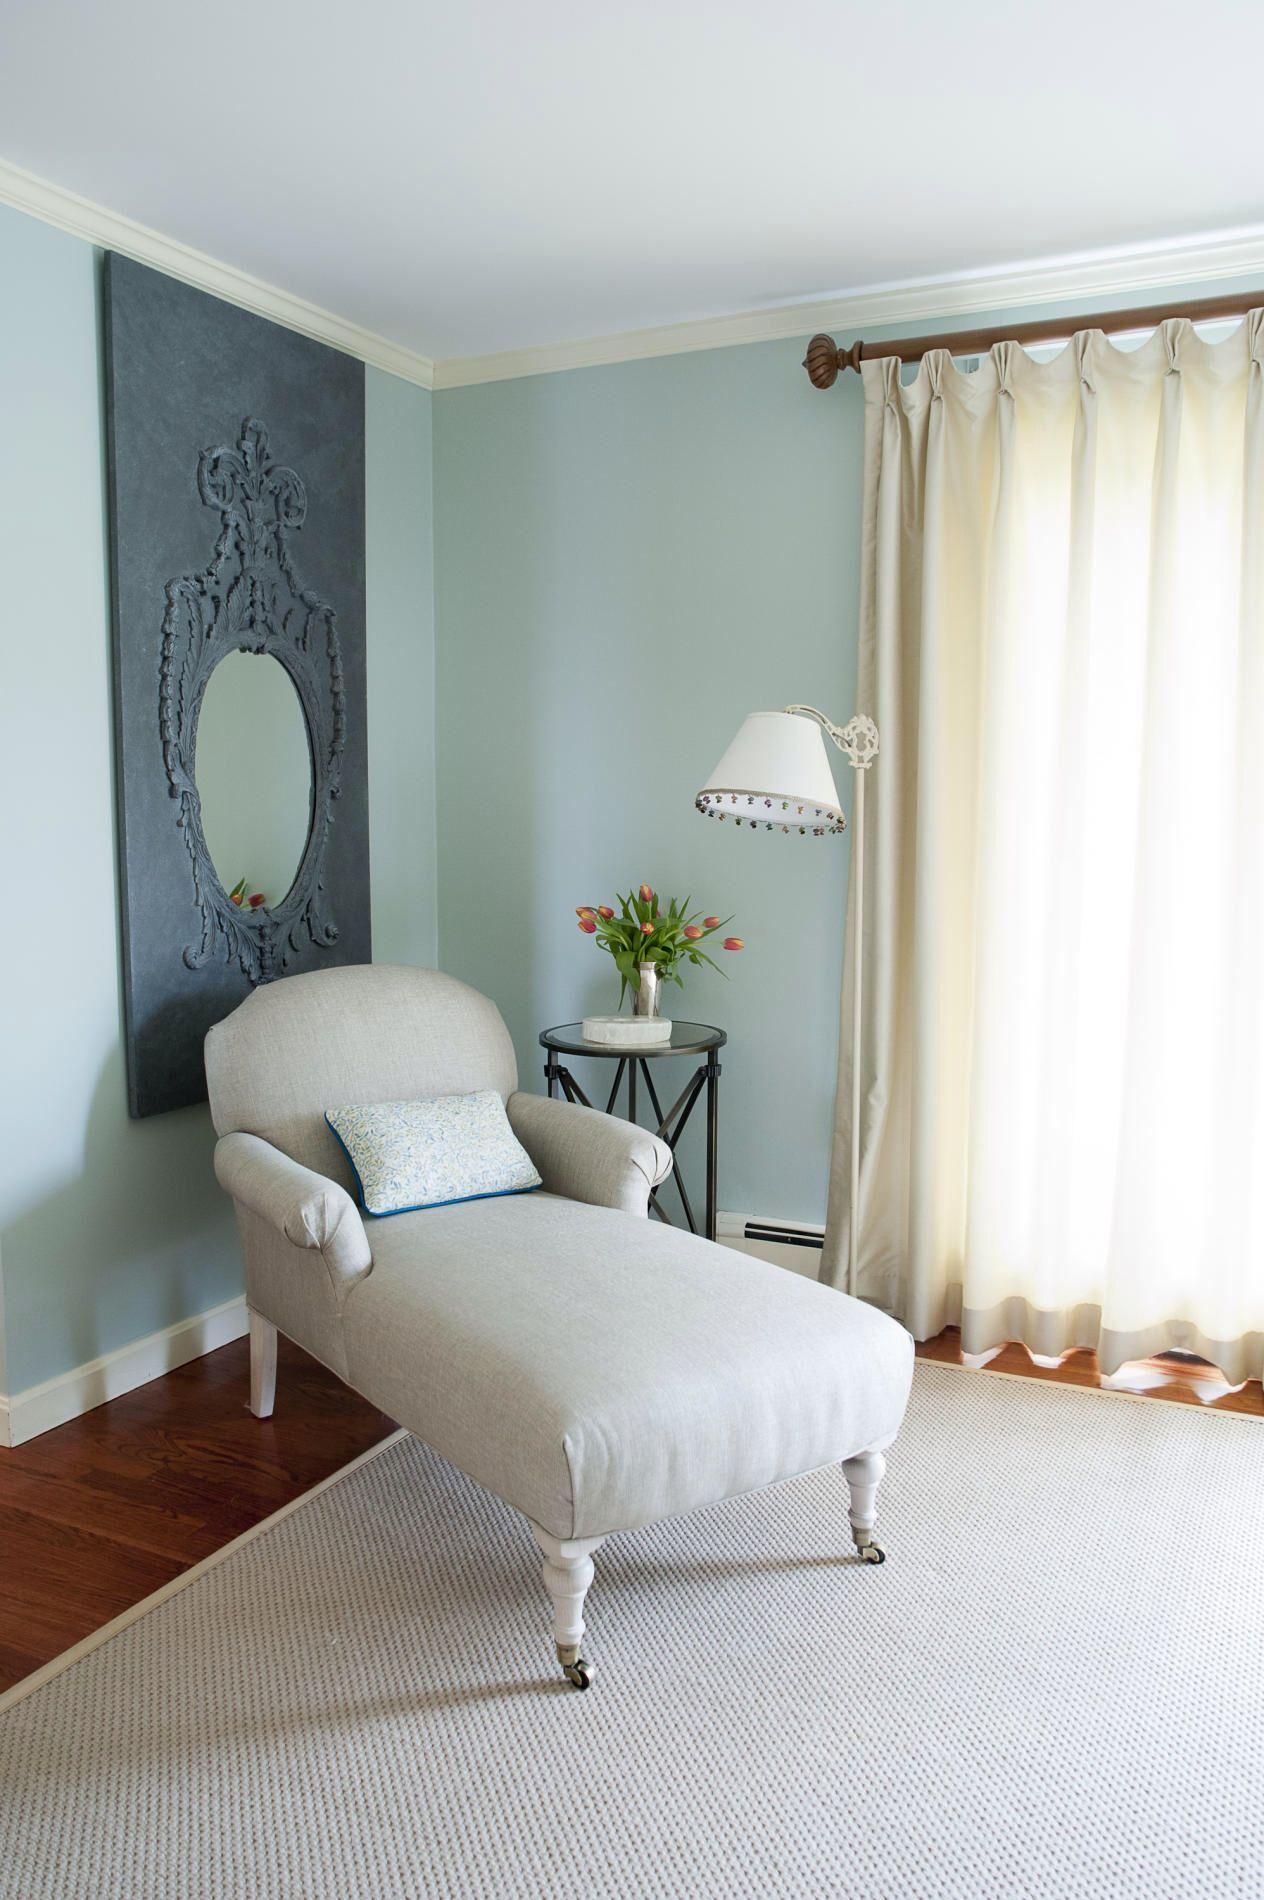 Benjamin Moore Palladium Blue 1st Floor Paint Color Made